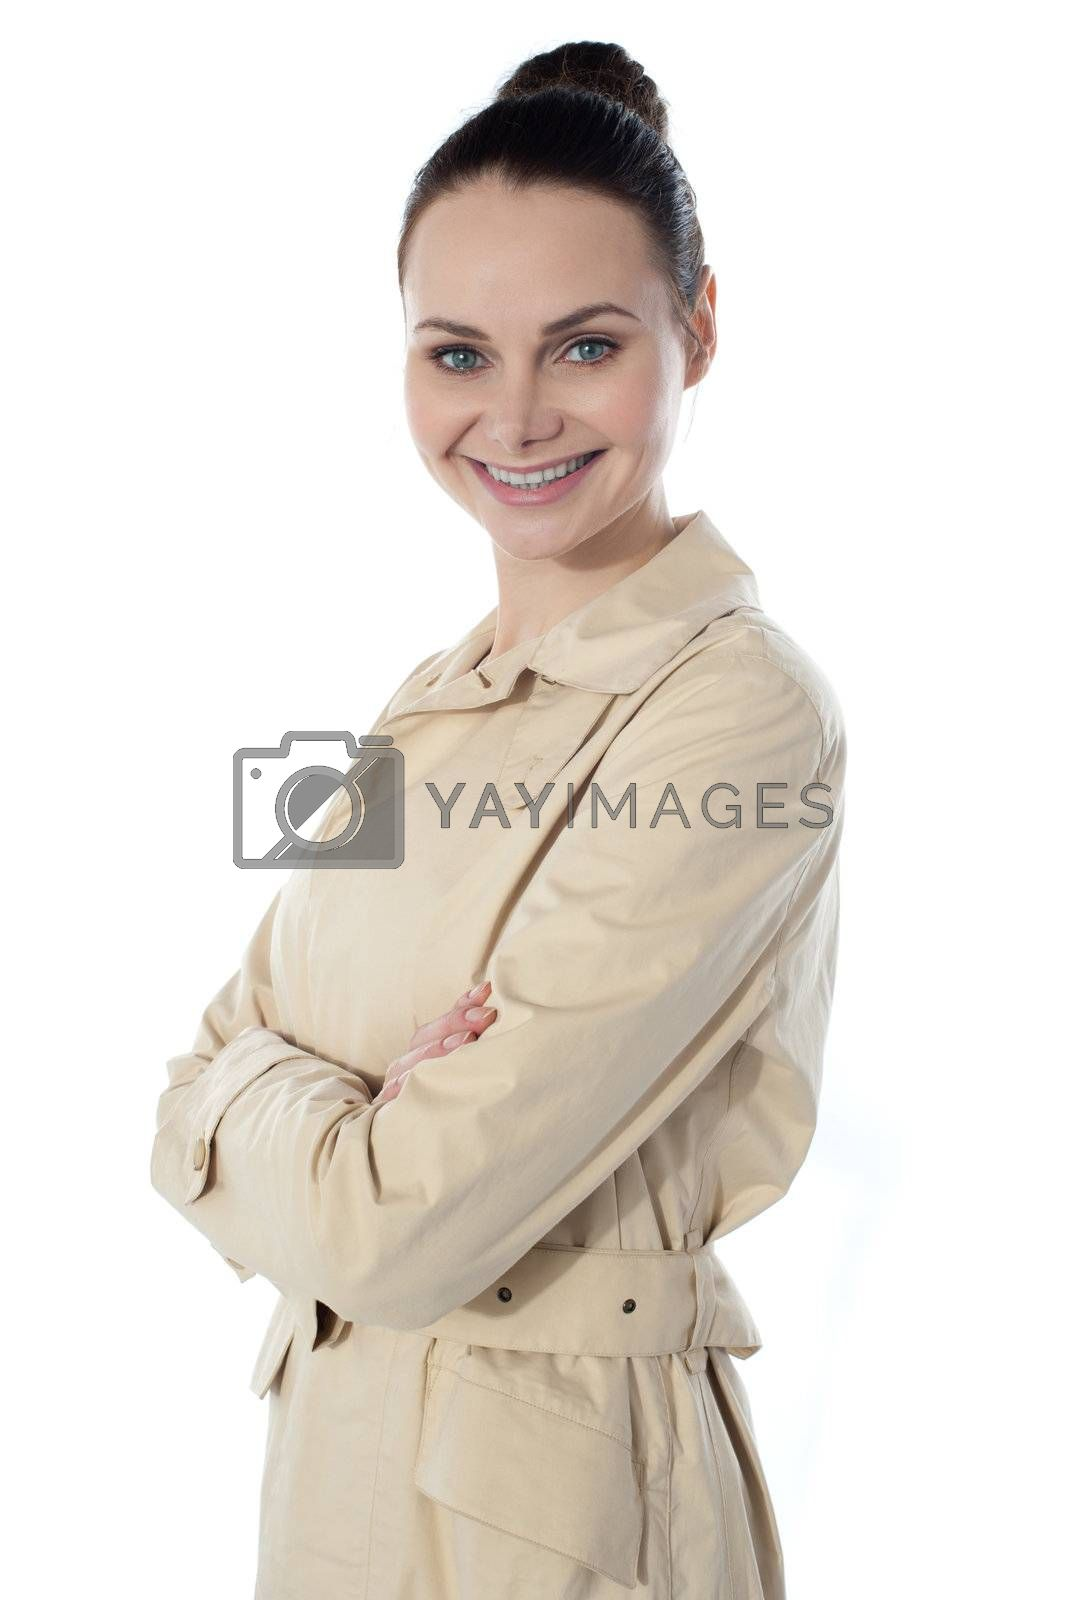 Fashionable glamor lady, smiling. Posing with folded arms